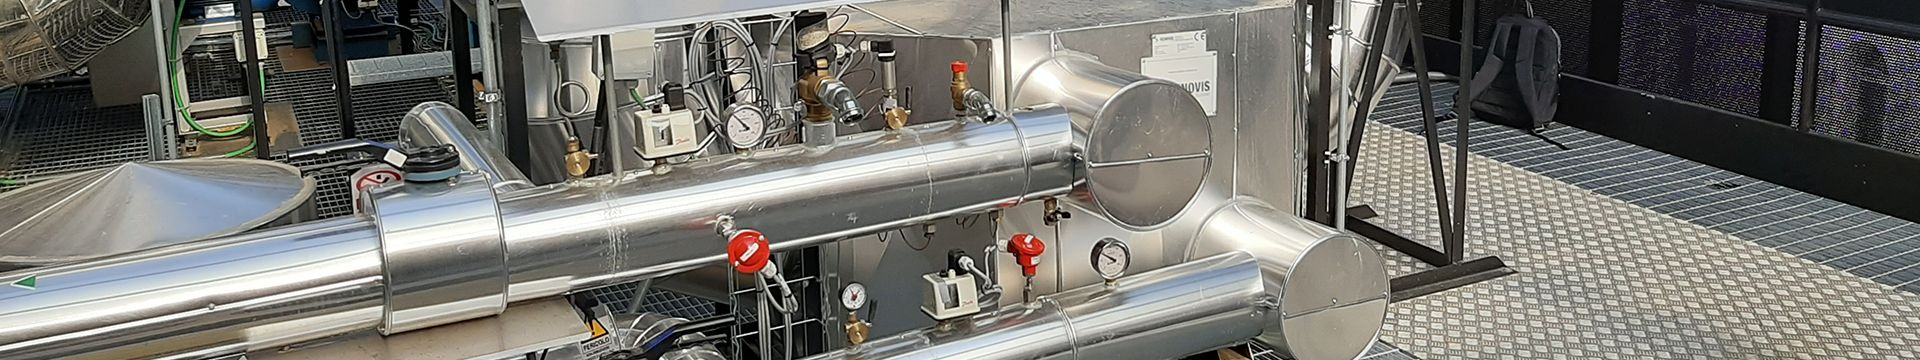 Efficienza energetica nell'industria dei metalli preziosi